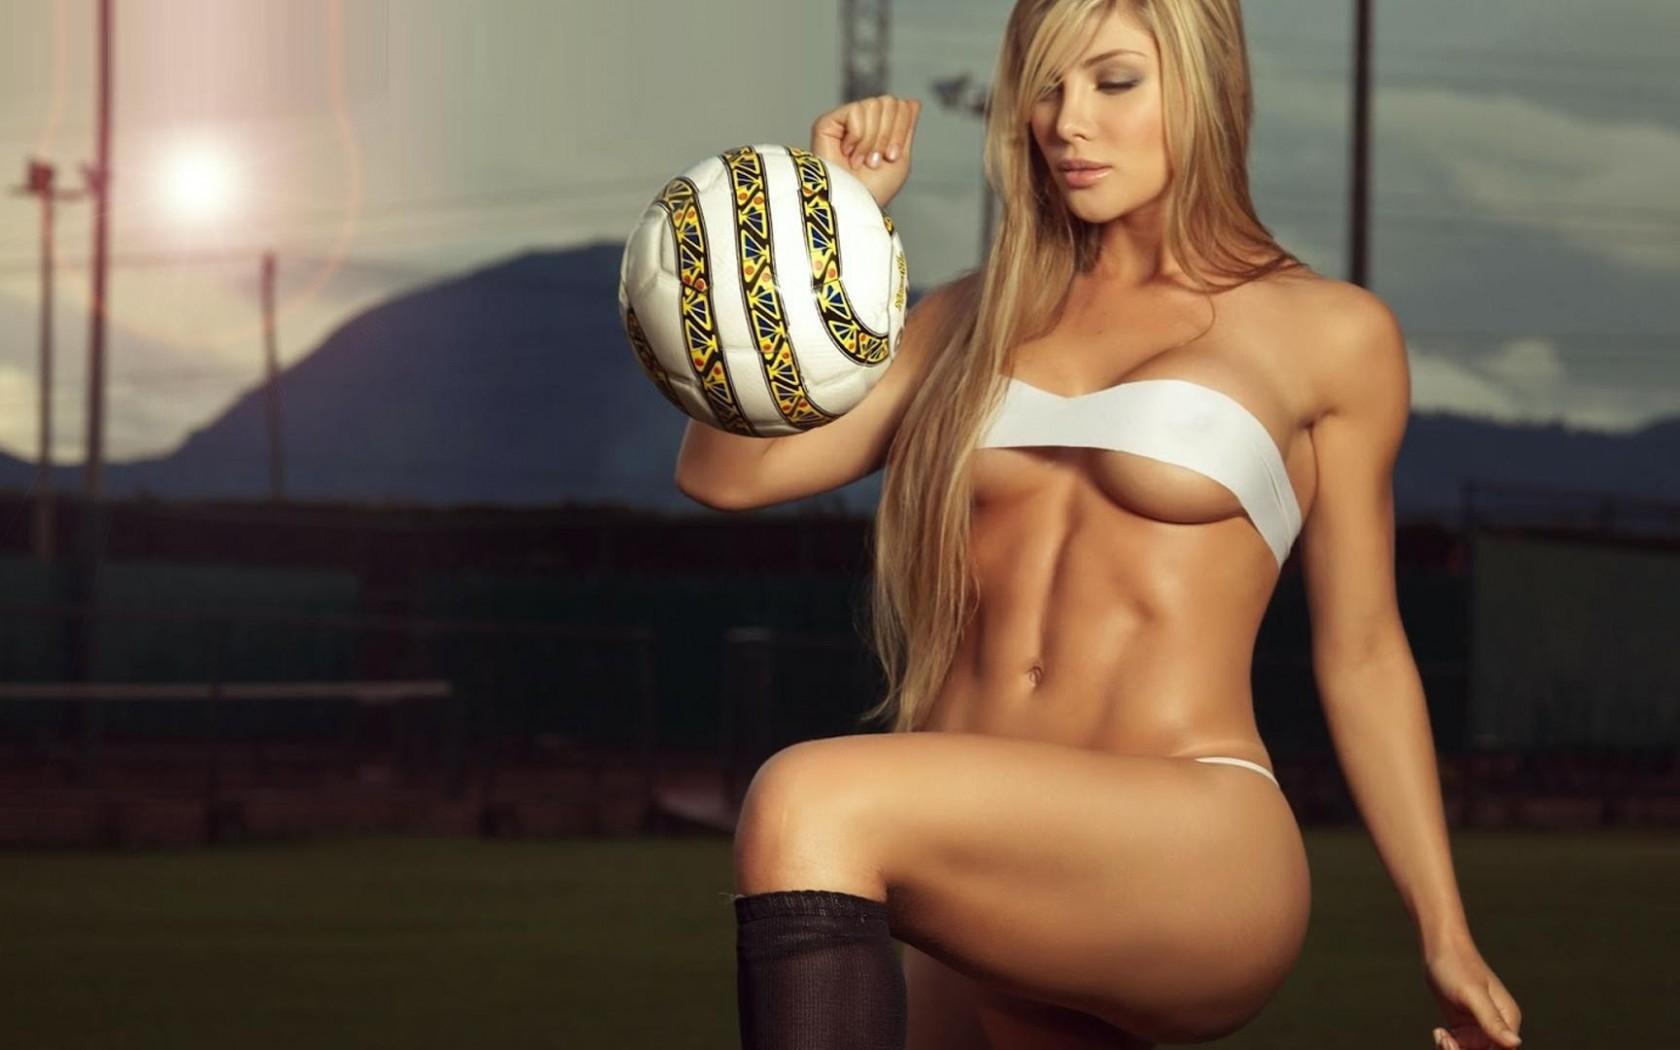 455980_devushka_blondinka_figura_sport_m-i17444